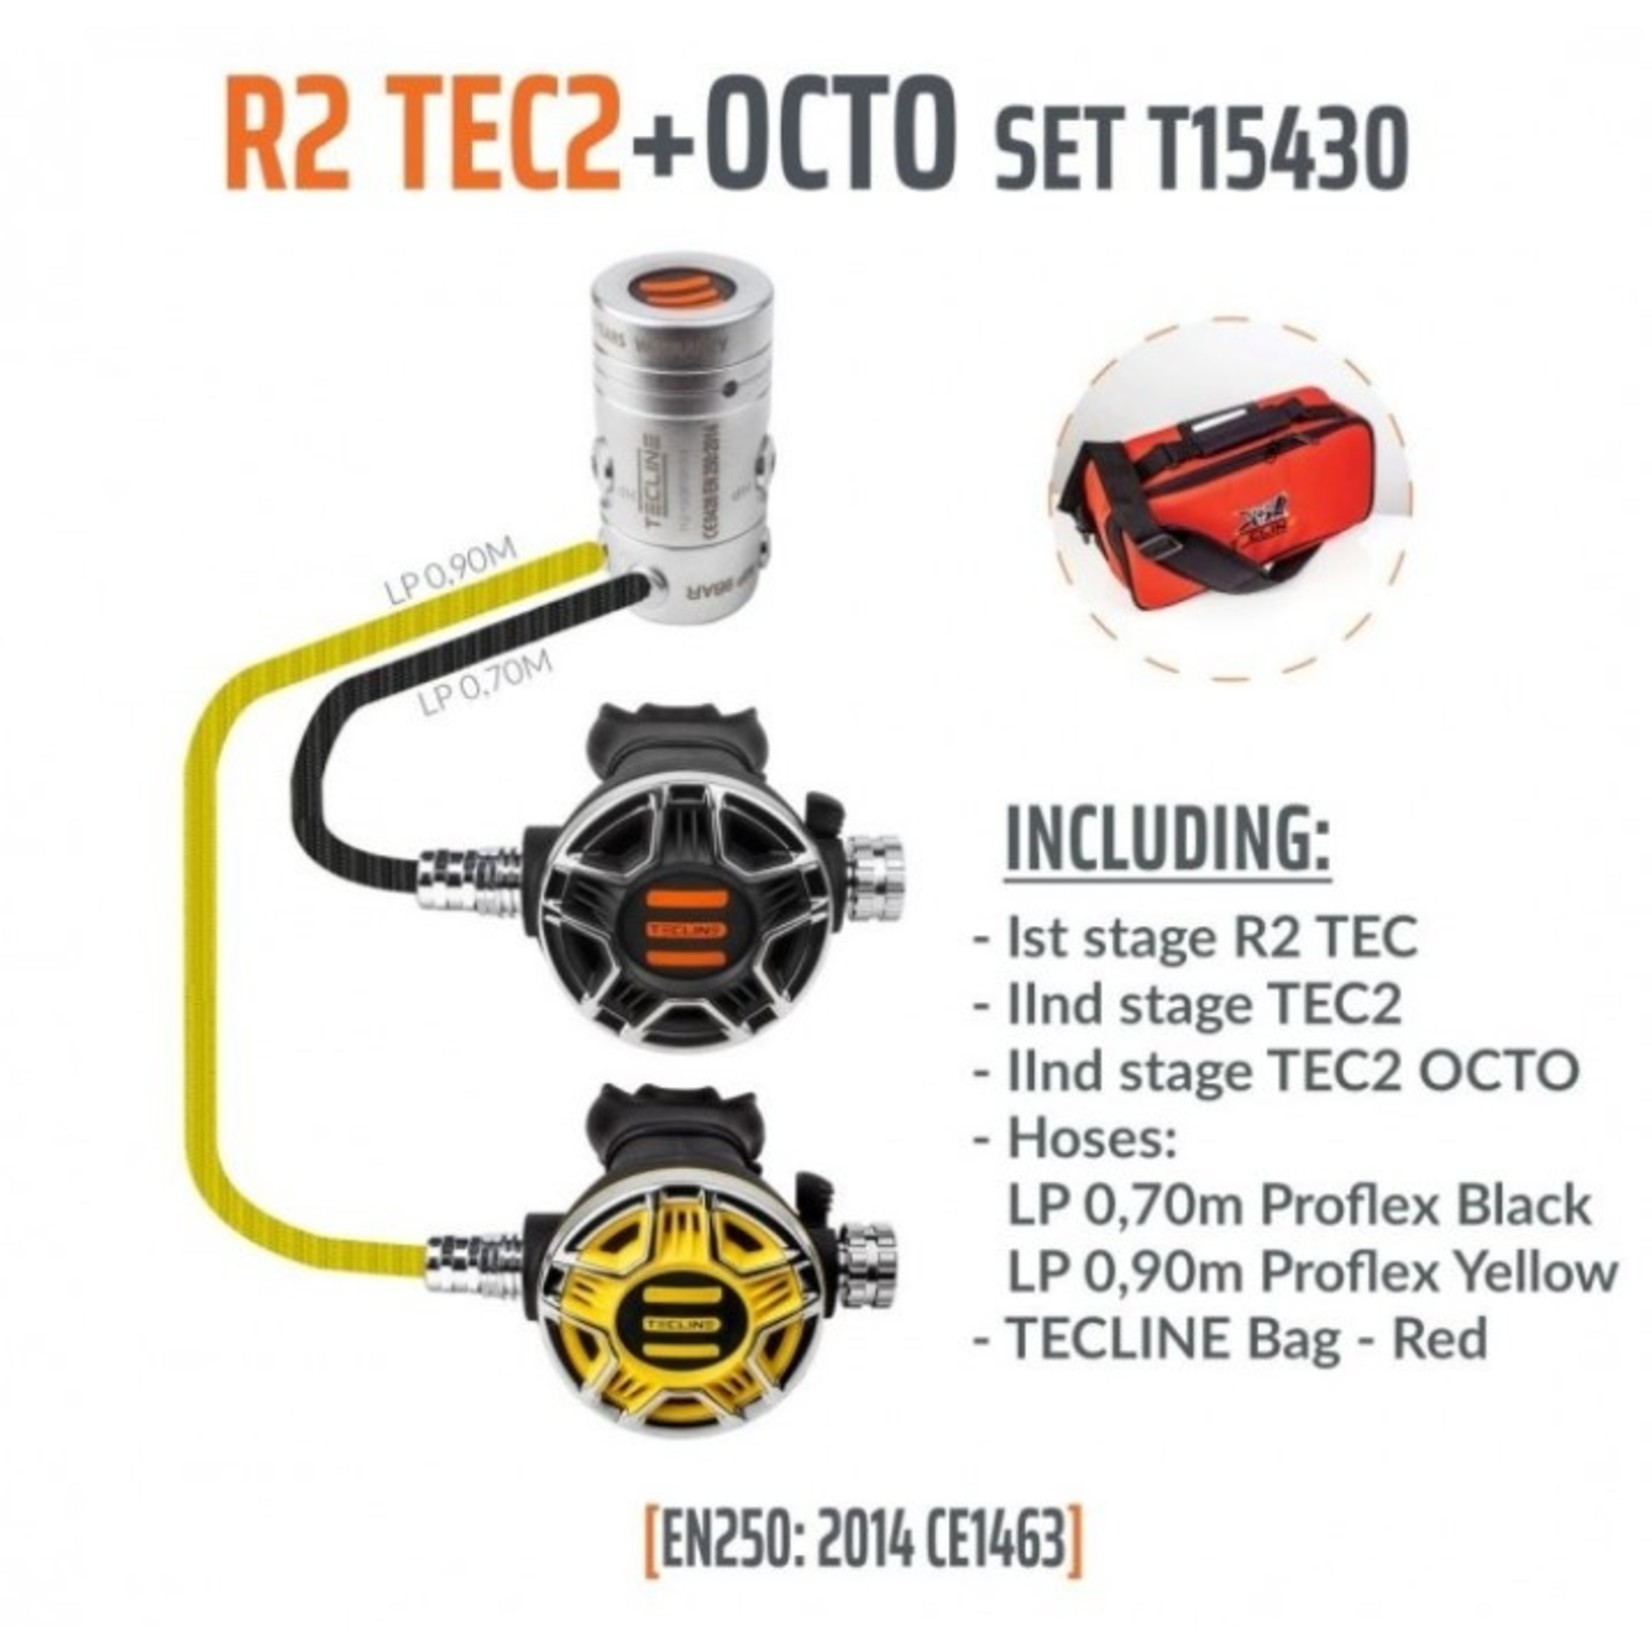 Tecline Regulator R2 TEC2 with octopus - EN250A